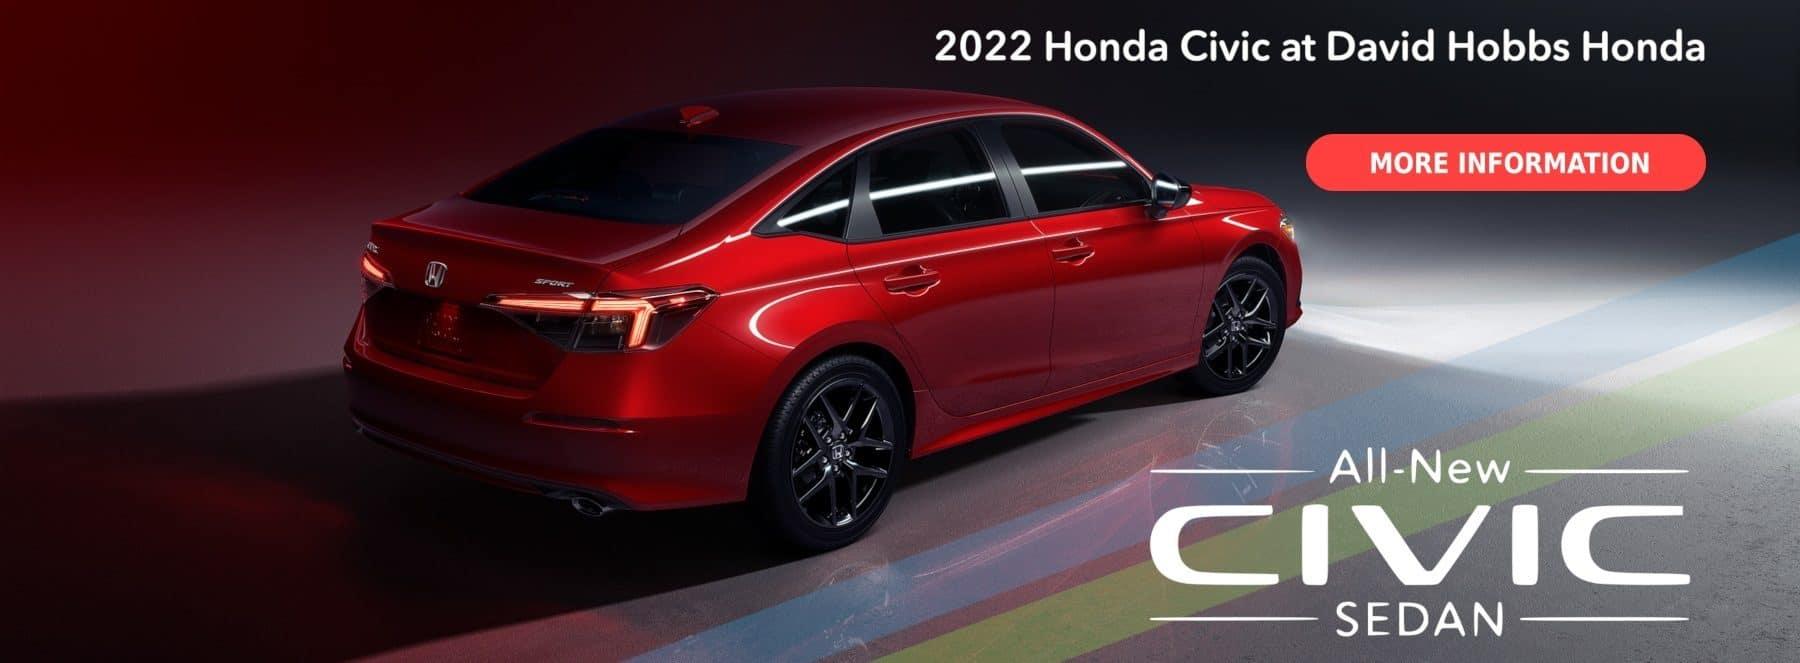 2022 Honda Civic at David Hobbs Honda